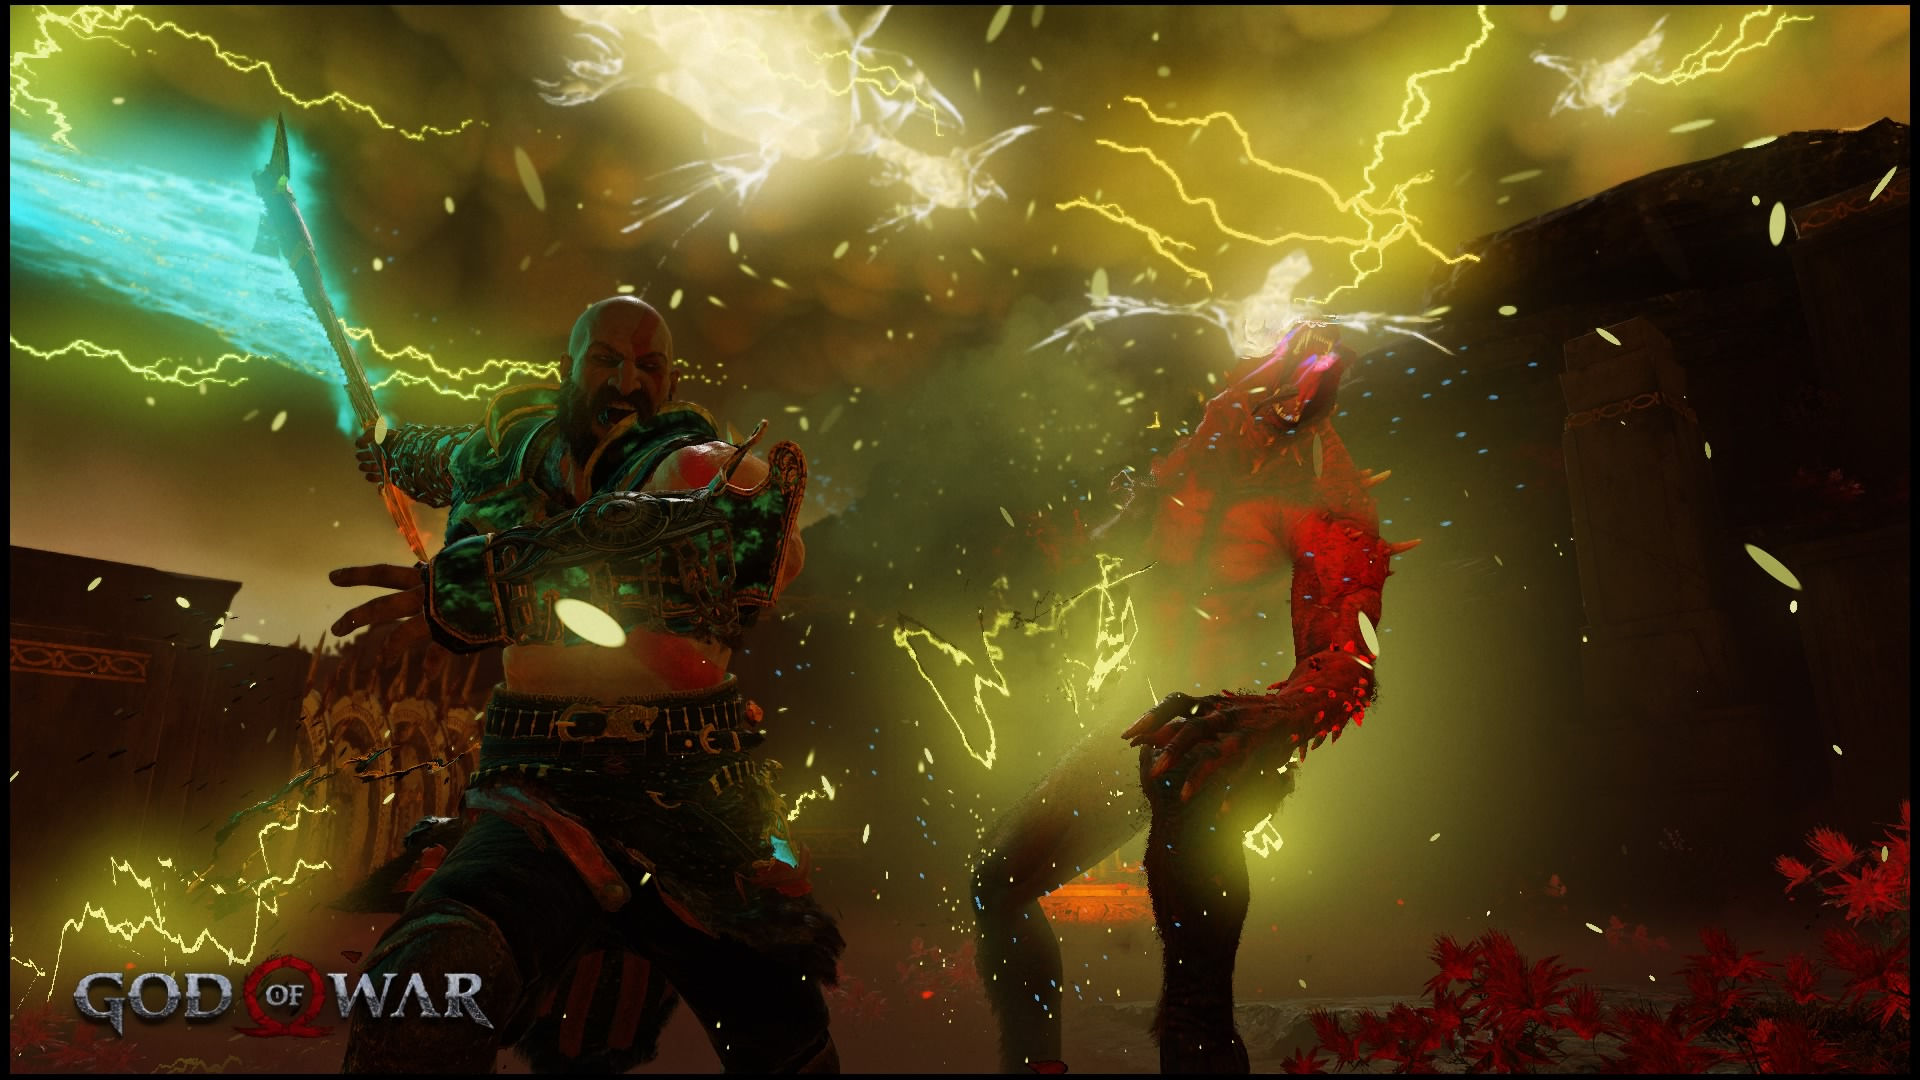 God of War - Screenshot - Leviathan Axe Strike 2.jpg